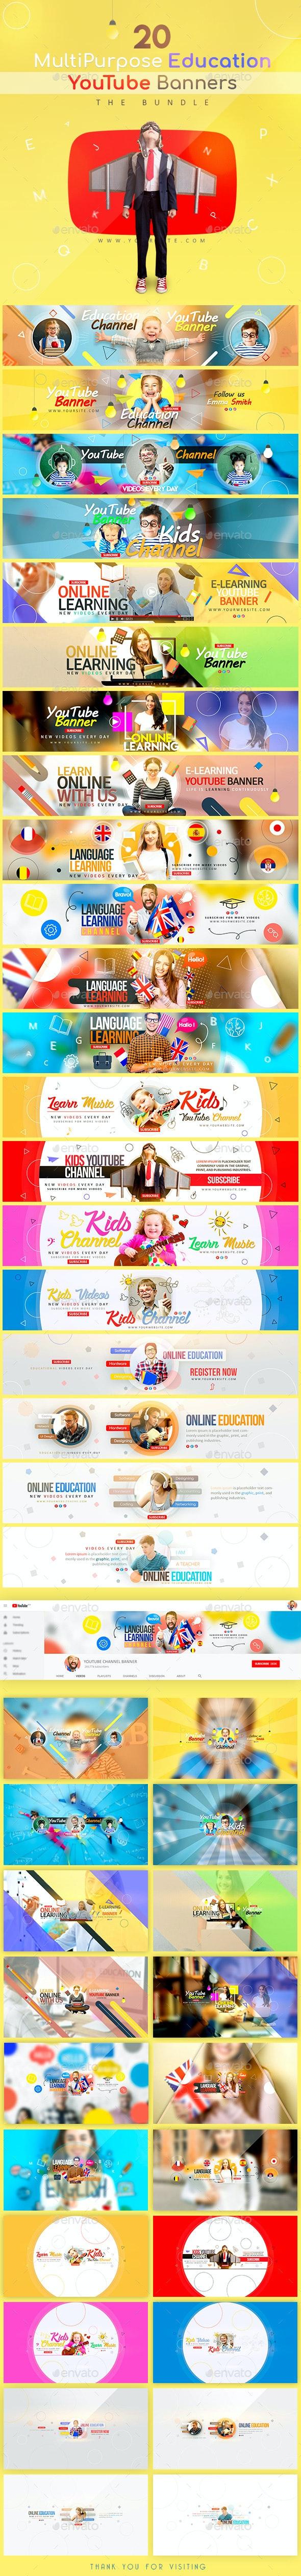 Education Bundle - 20 MultiPurpose YouTube Banners - YouTube Social Media